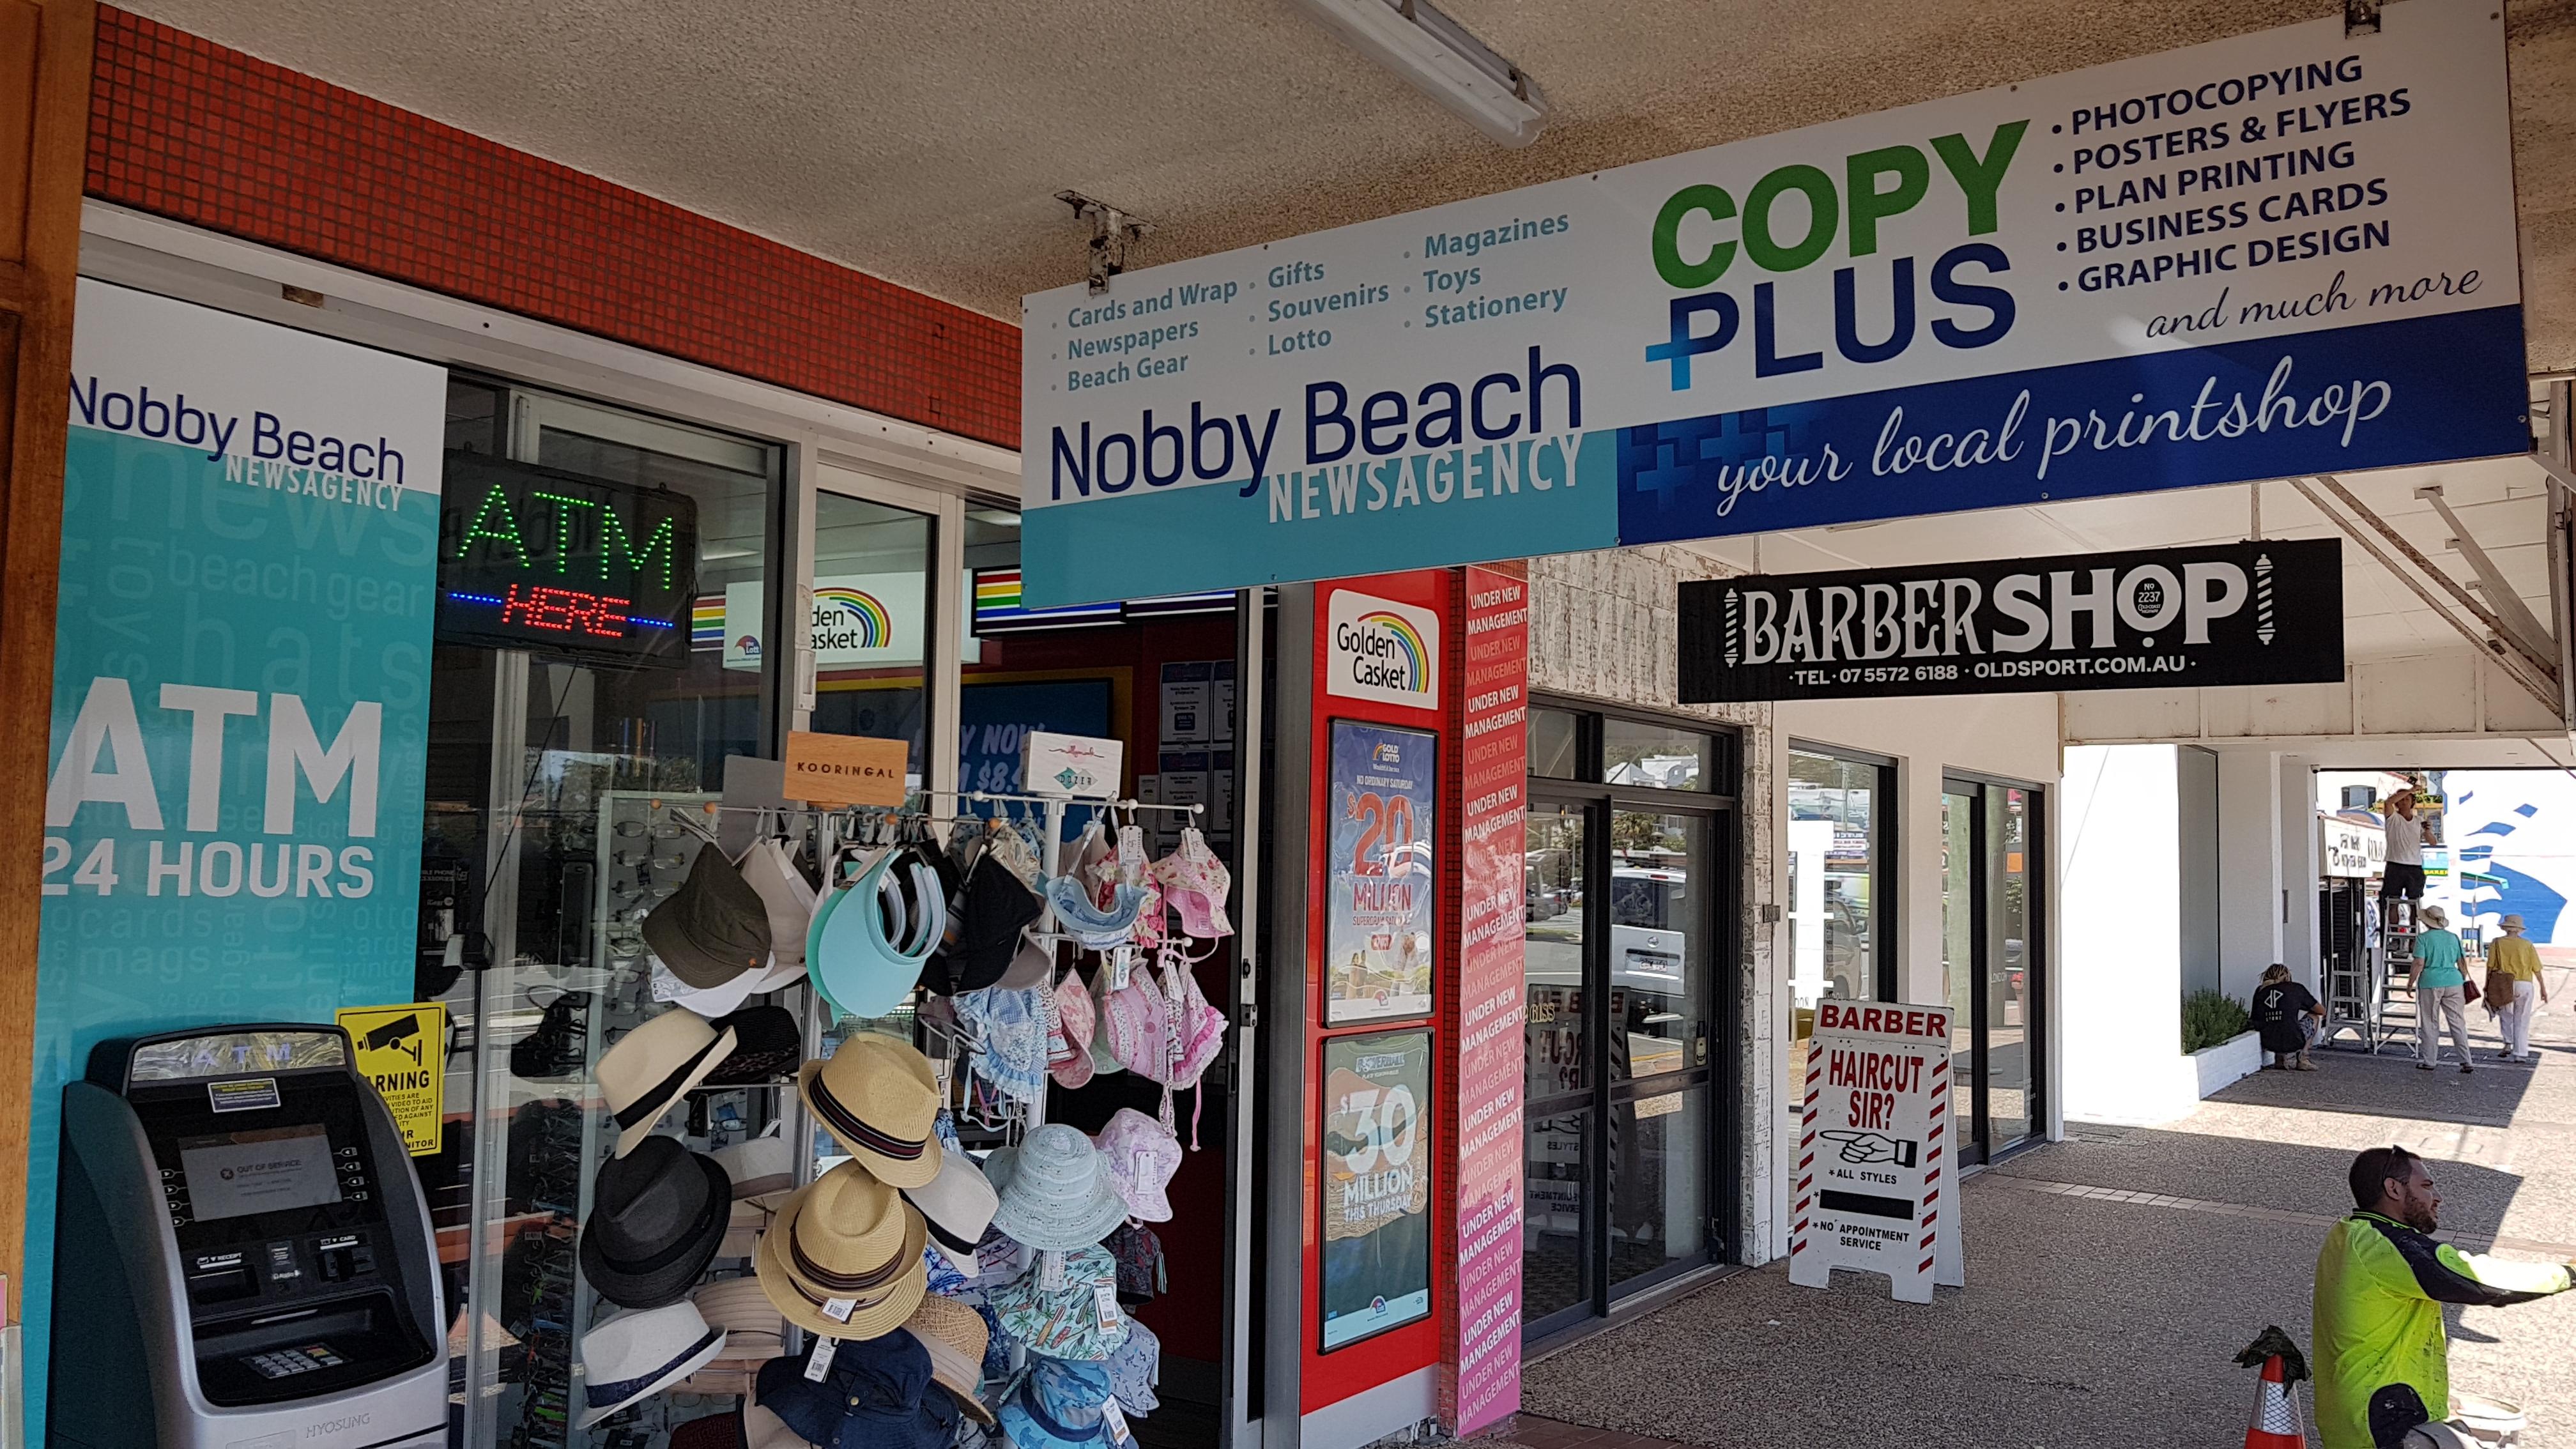 NEWSAGENCY – Nobby Beach ID#4544333  – Bargain !! Won't last long